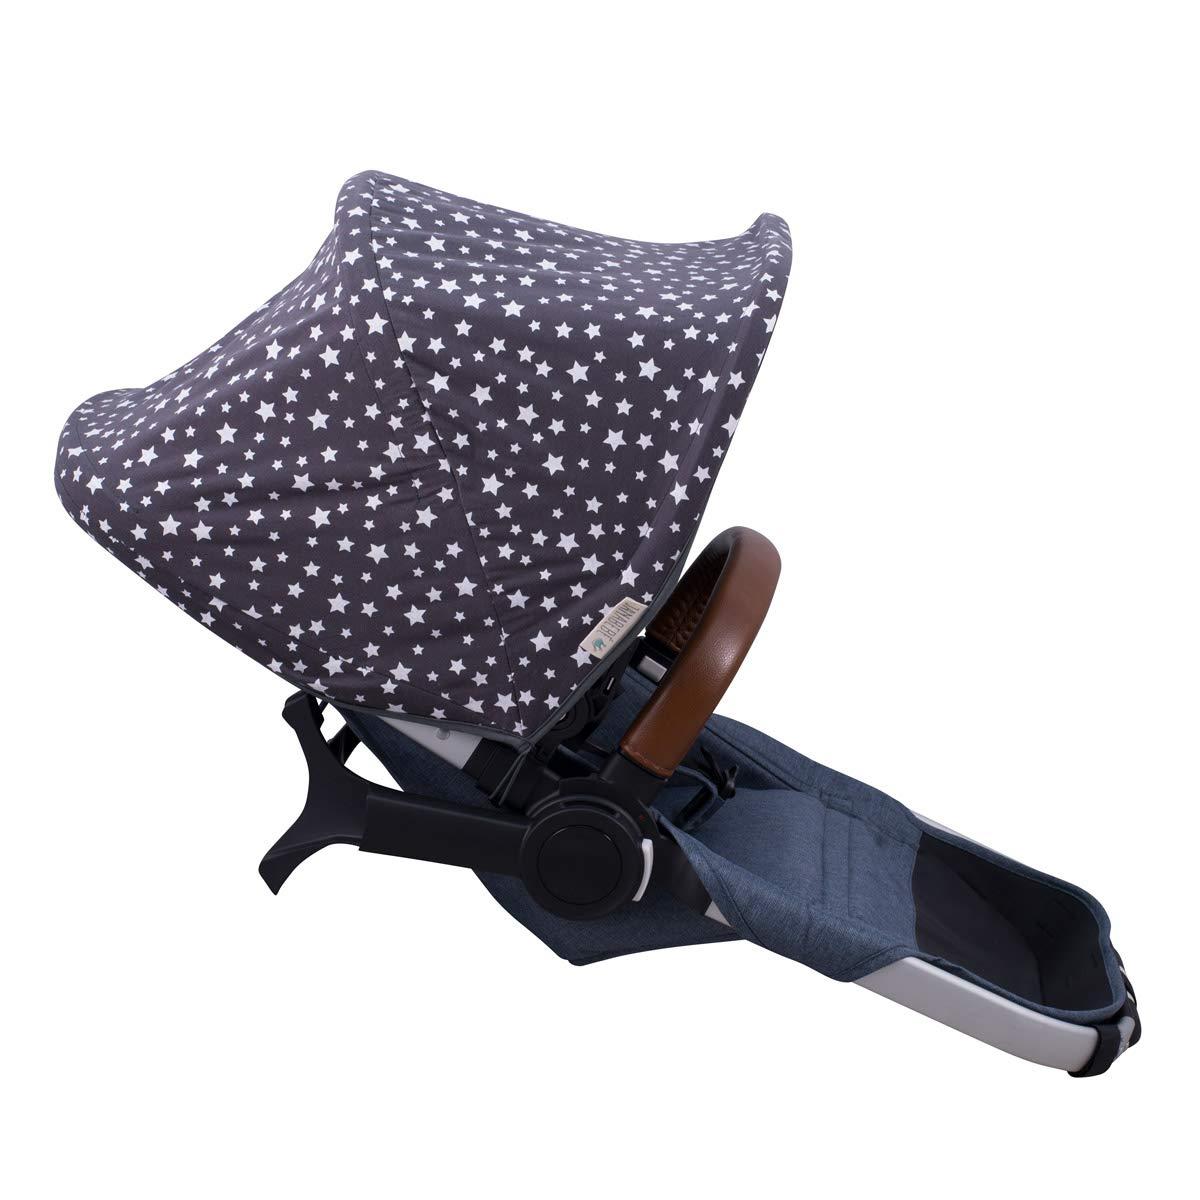 JANABEBE Hood Canopy Compatible with Bugaboo Donkey (Winter Sky)